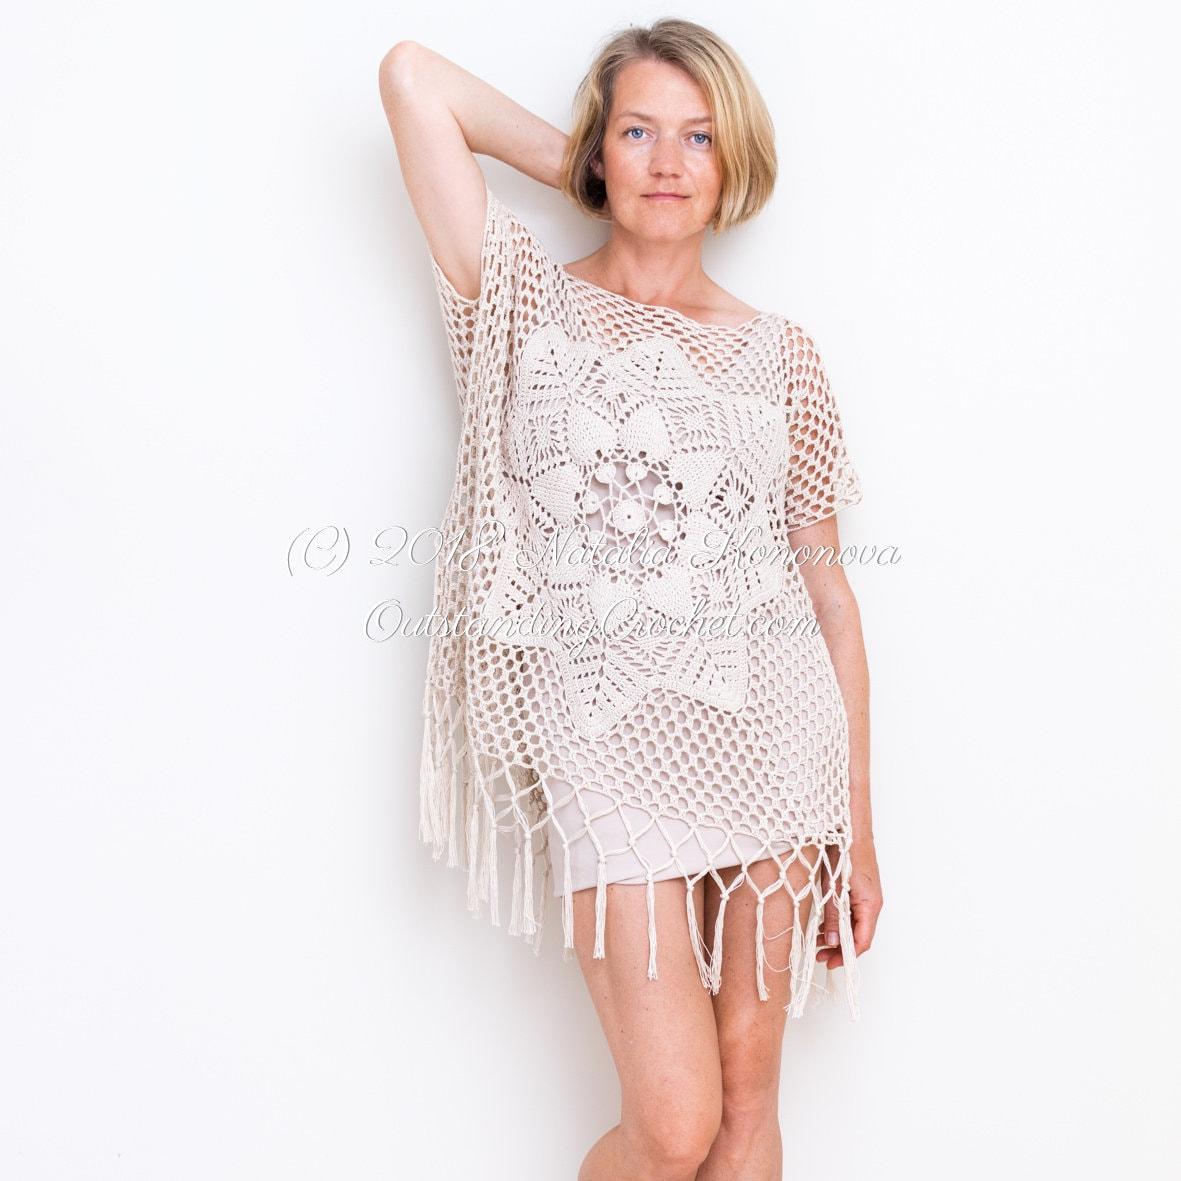 fa062dfdb Crochet Top PATTERN Desert Woman Summer Dress Tunic | Etsy